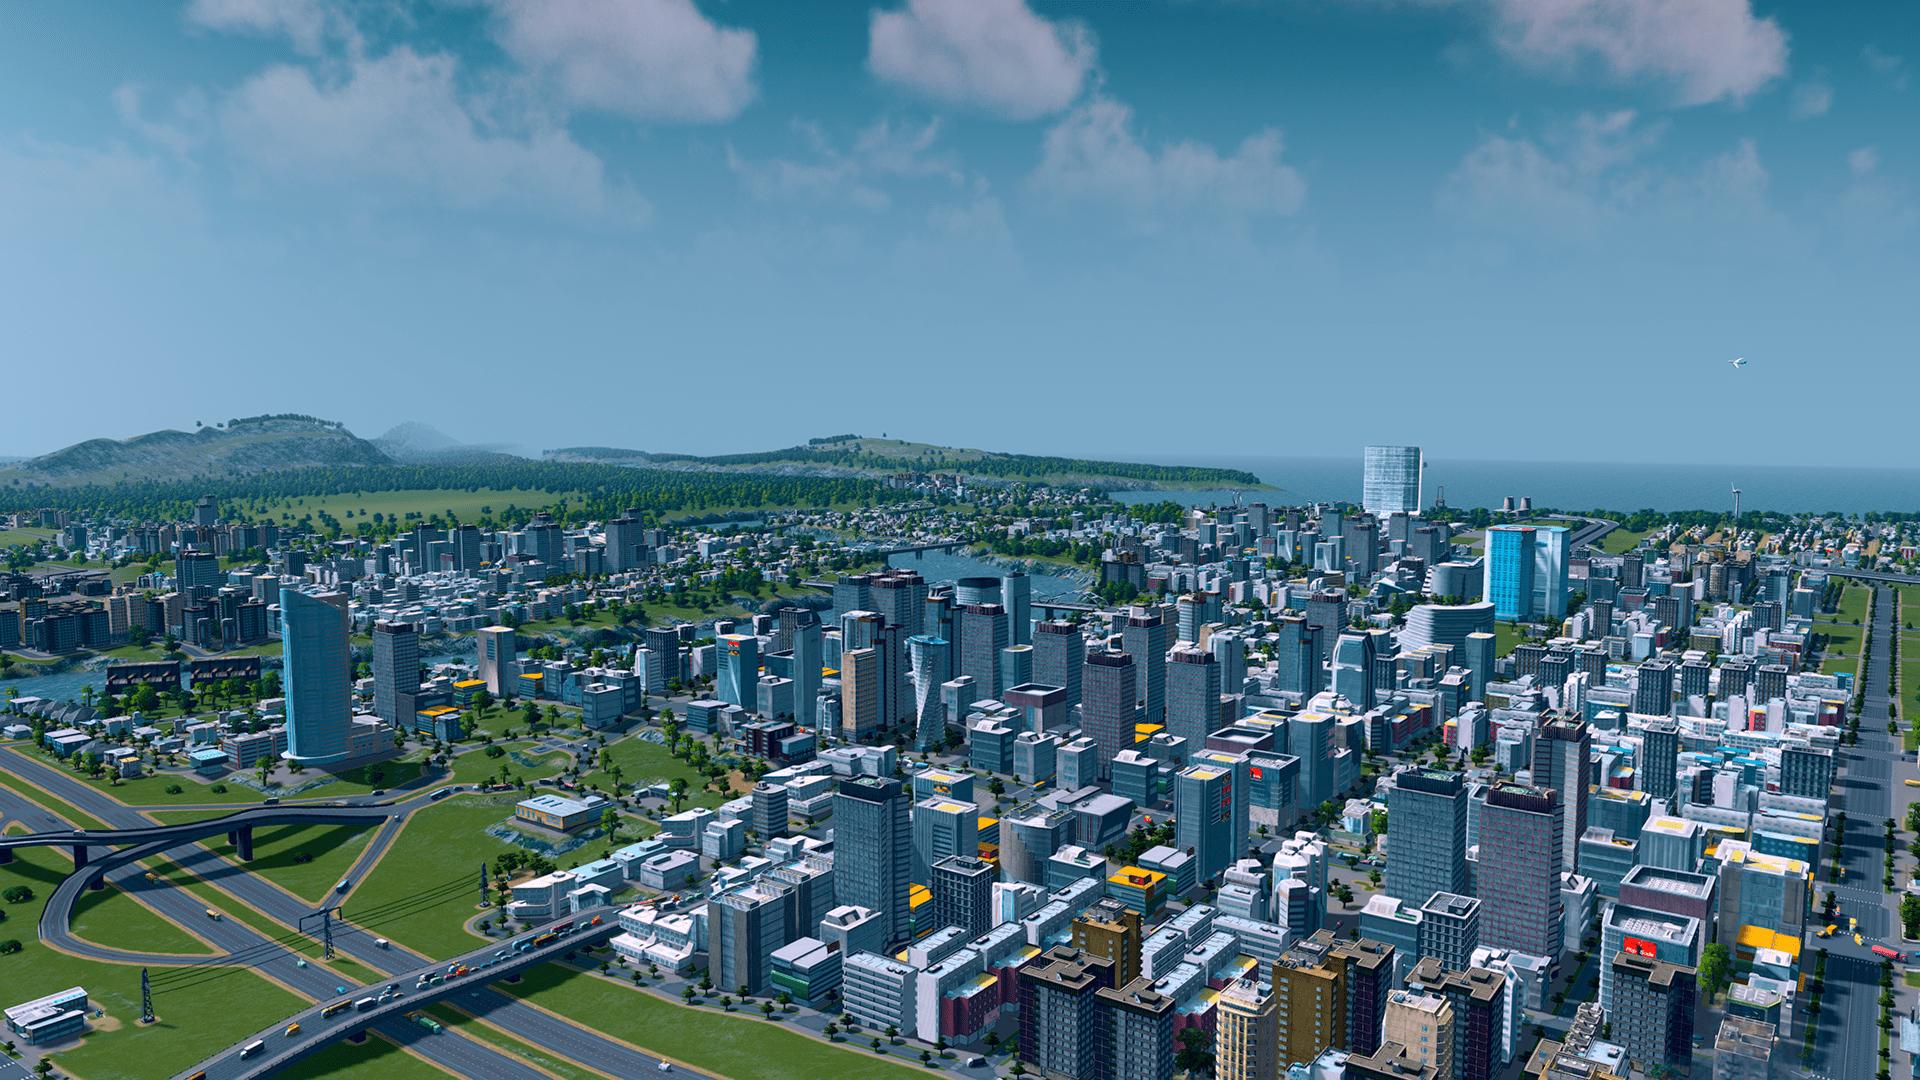 Cities Skylines Wallpapers - Top Free ...